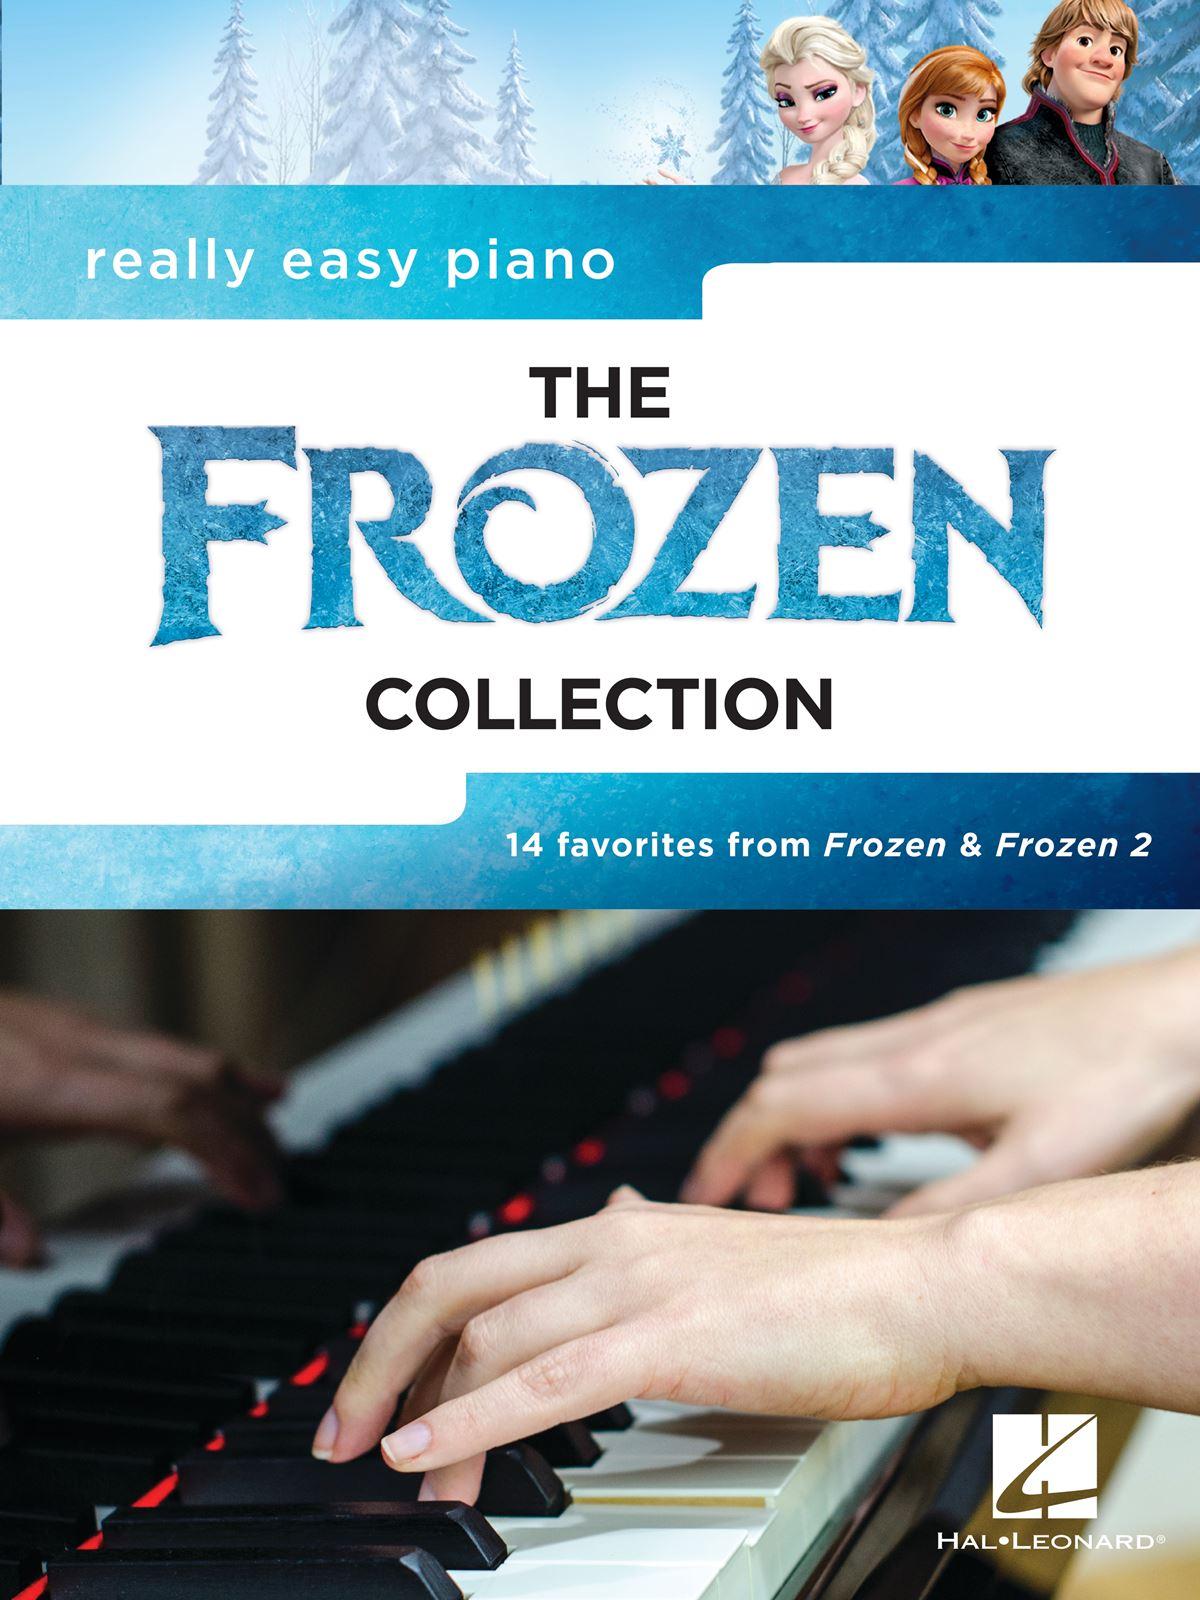 Really Easy Piano: the Frozen Collection: Piano Solo: Album Songbook